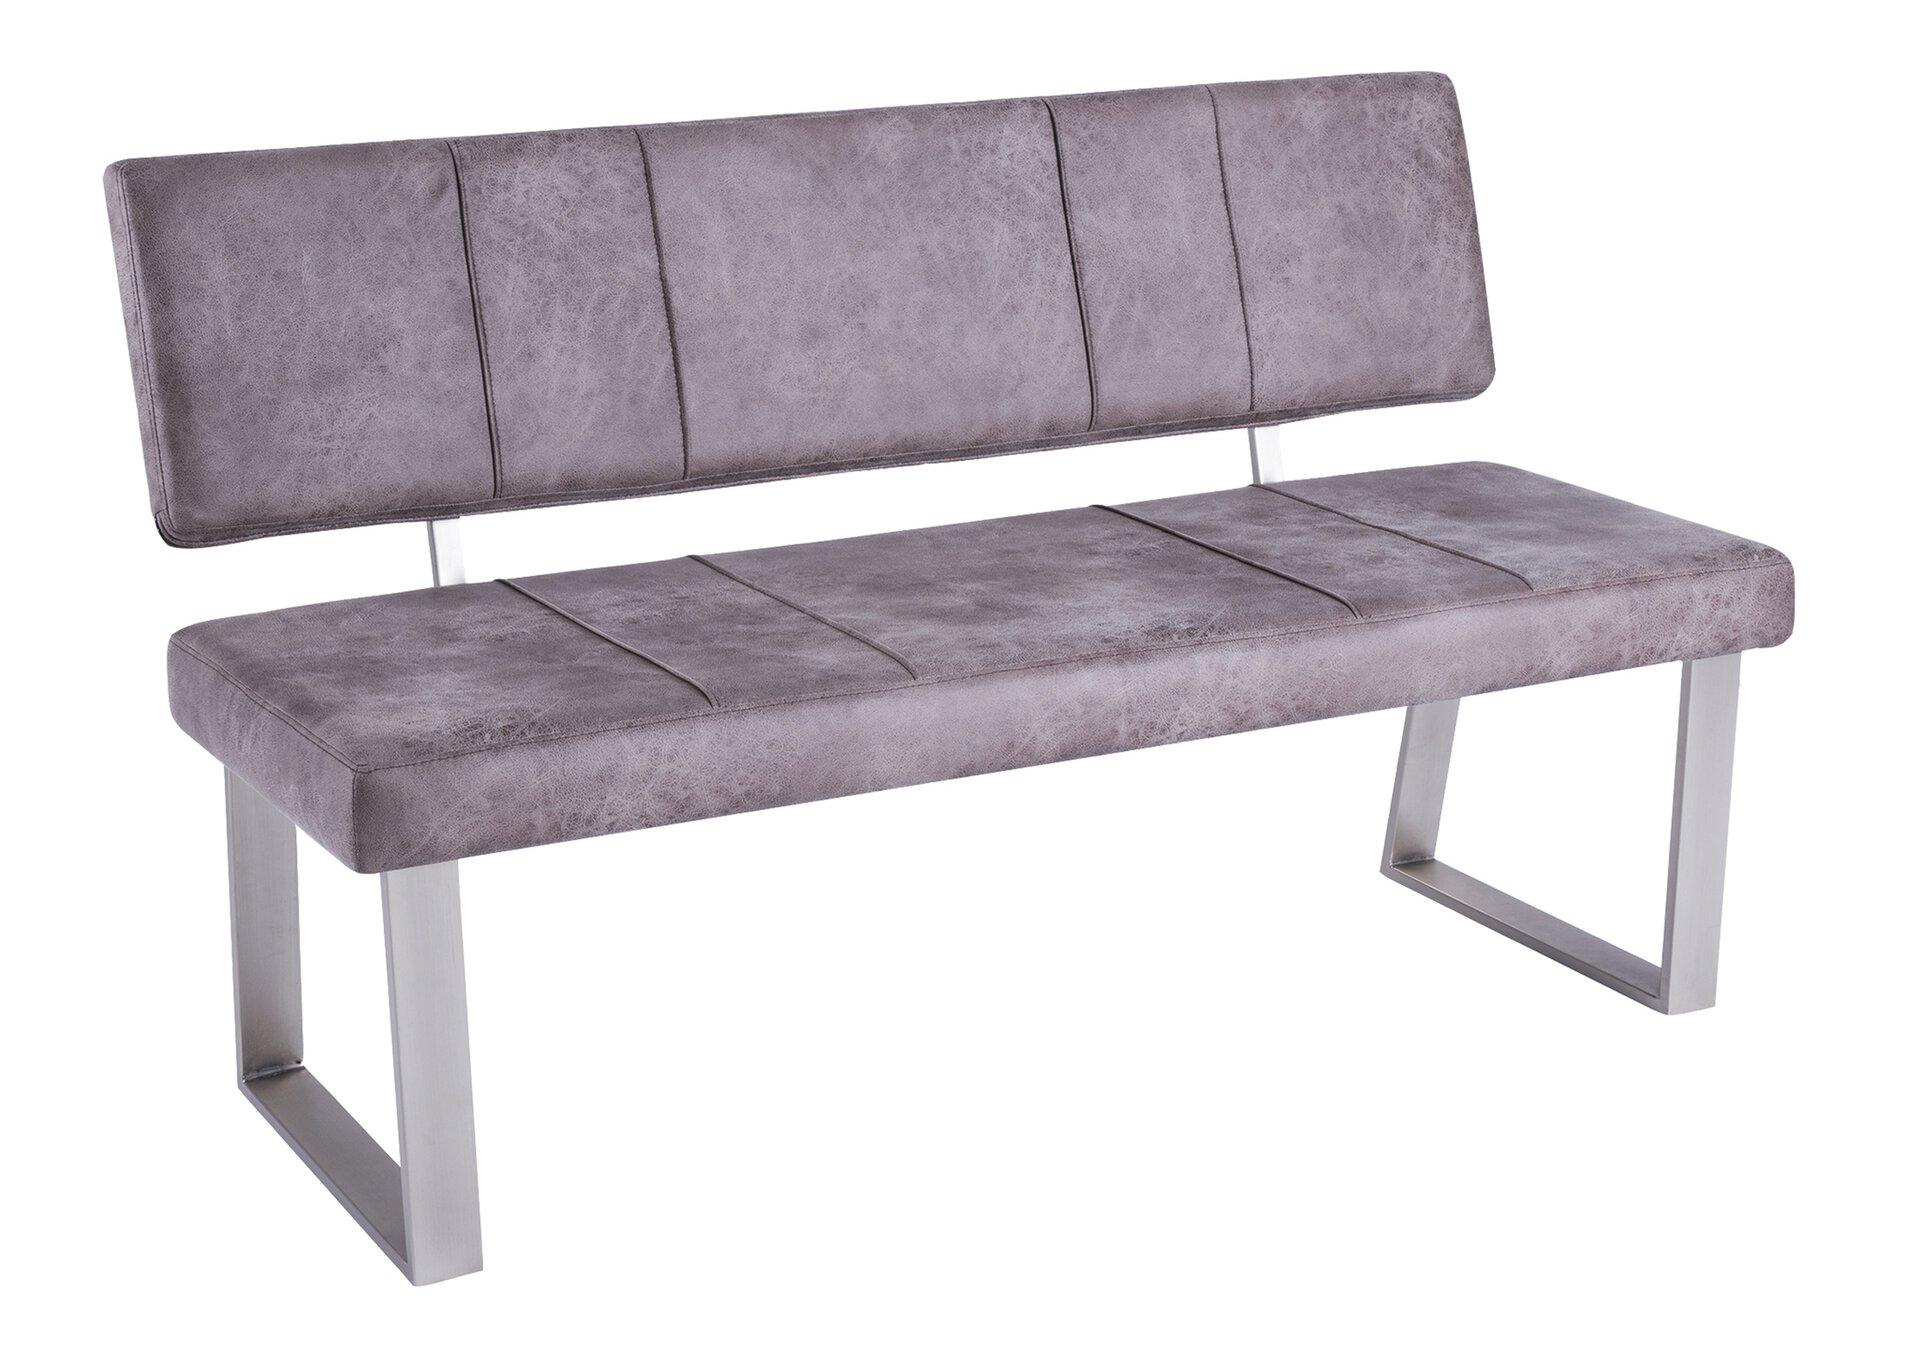 Sitzbank SANTA TRIESTE Dinett Holzwerkstoff 58 x 85 x 140 cm